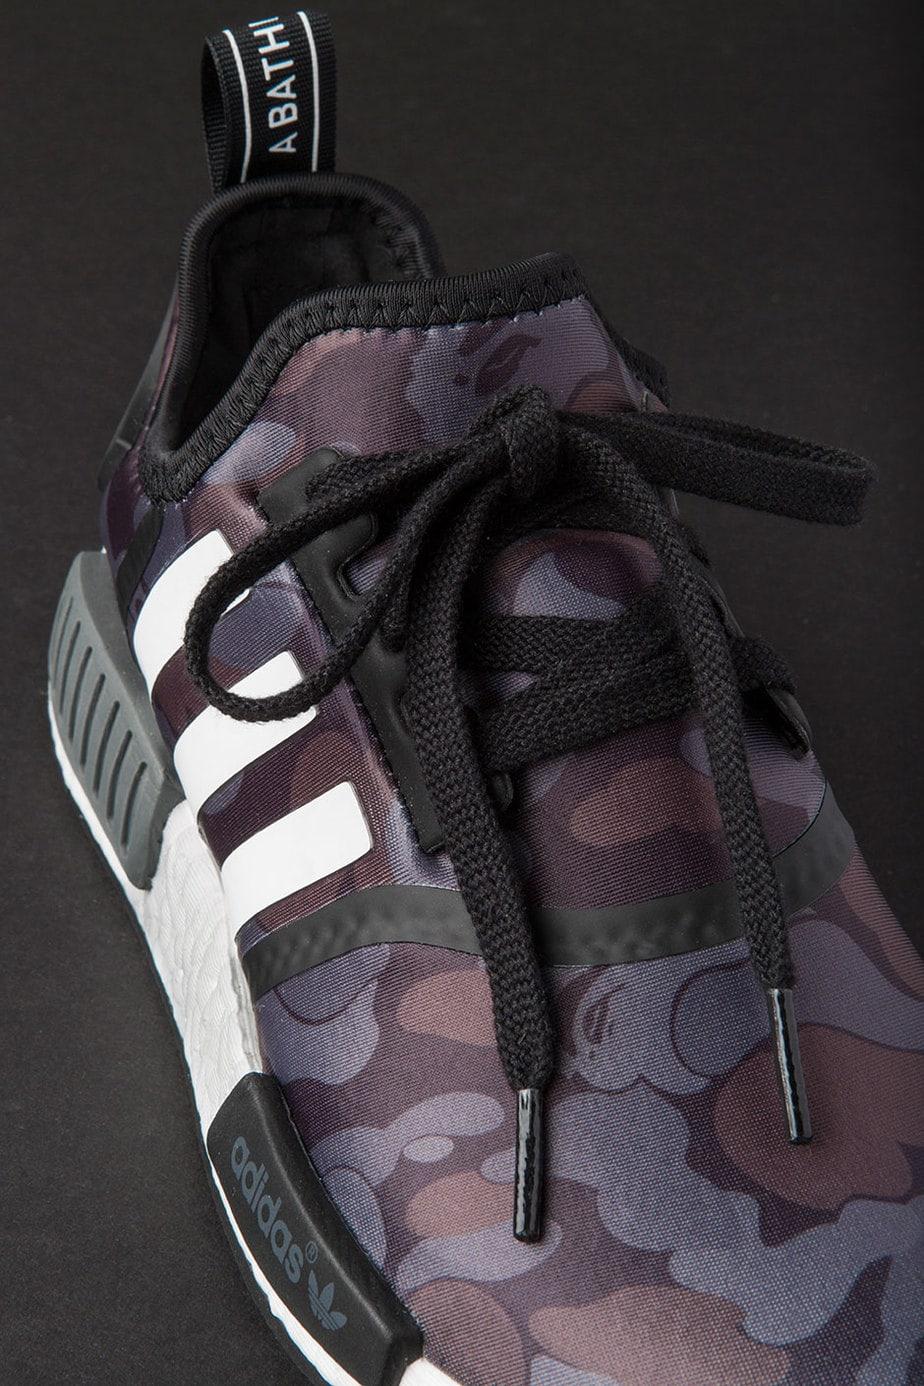 mvgsue BAPE x adidas NMD R1 Release Date - JustFreshKicks